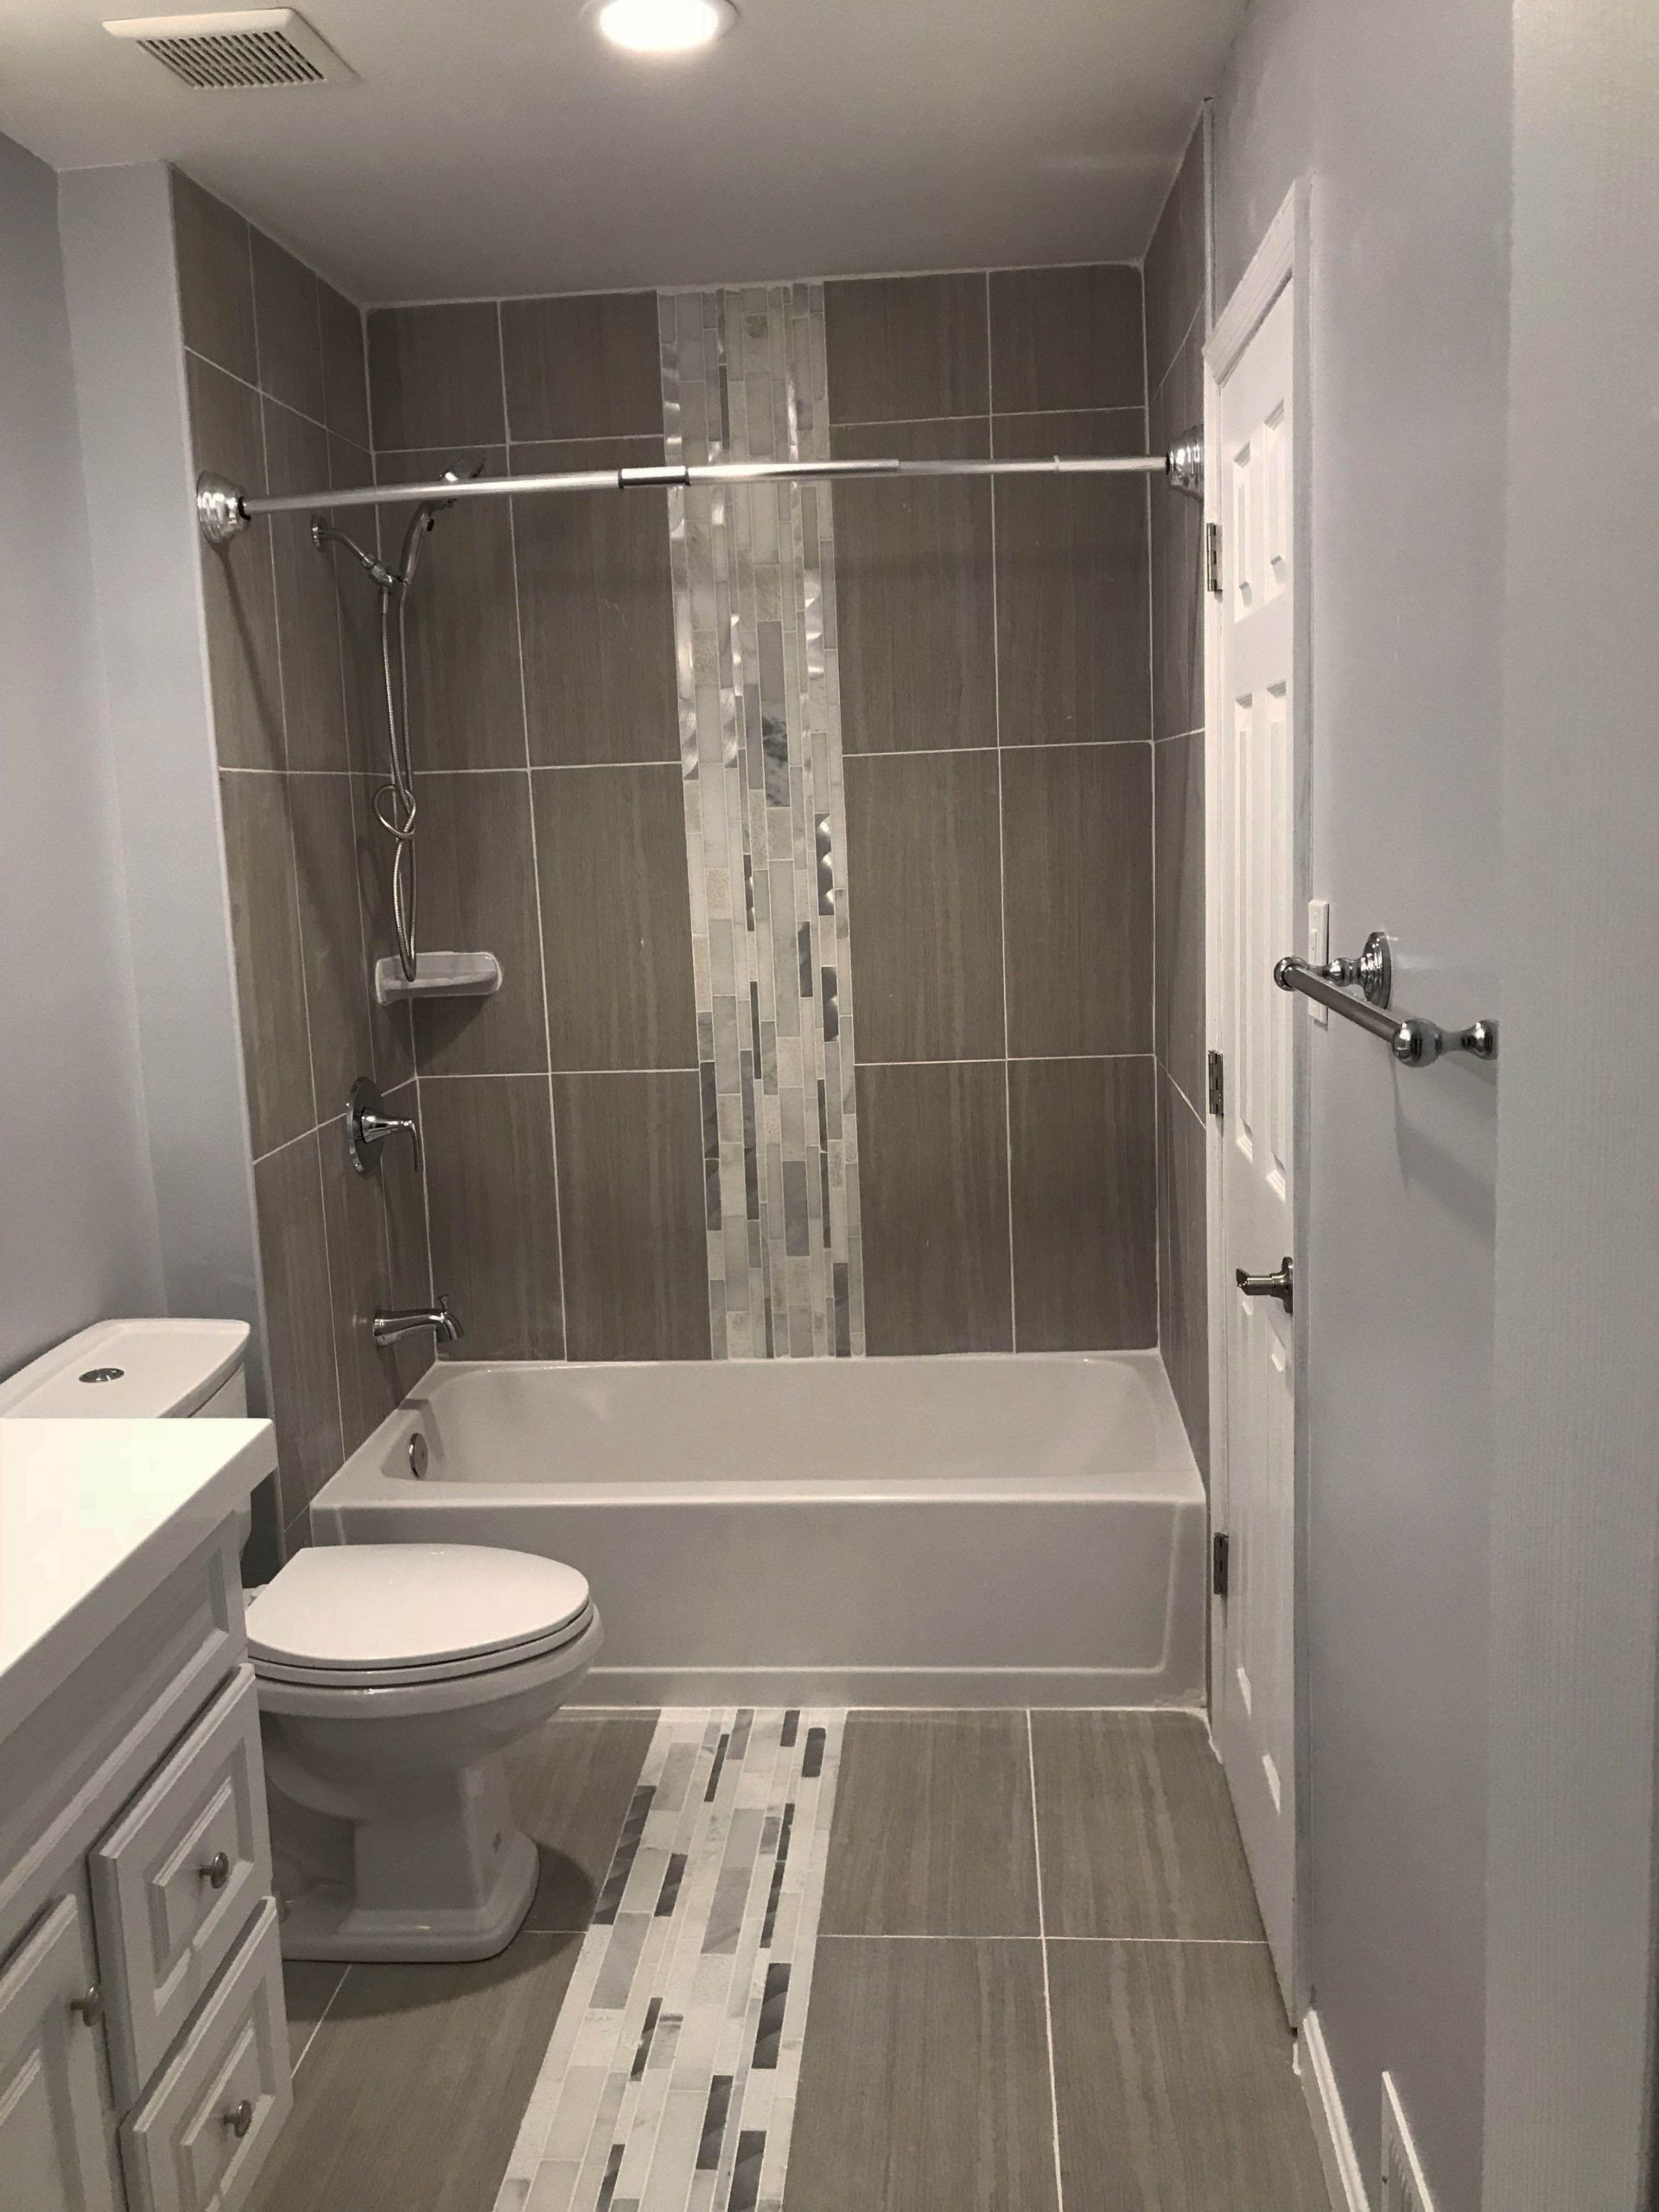 1 Lowes Bathroom Remodel That Had Gone Way Too Far Lowes Bathroom Remodel Bathrooms Remodel Bathroom Design Master Bathroom Design